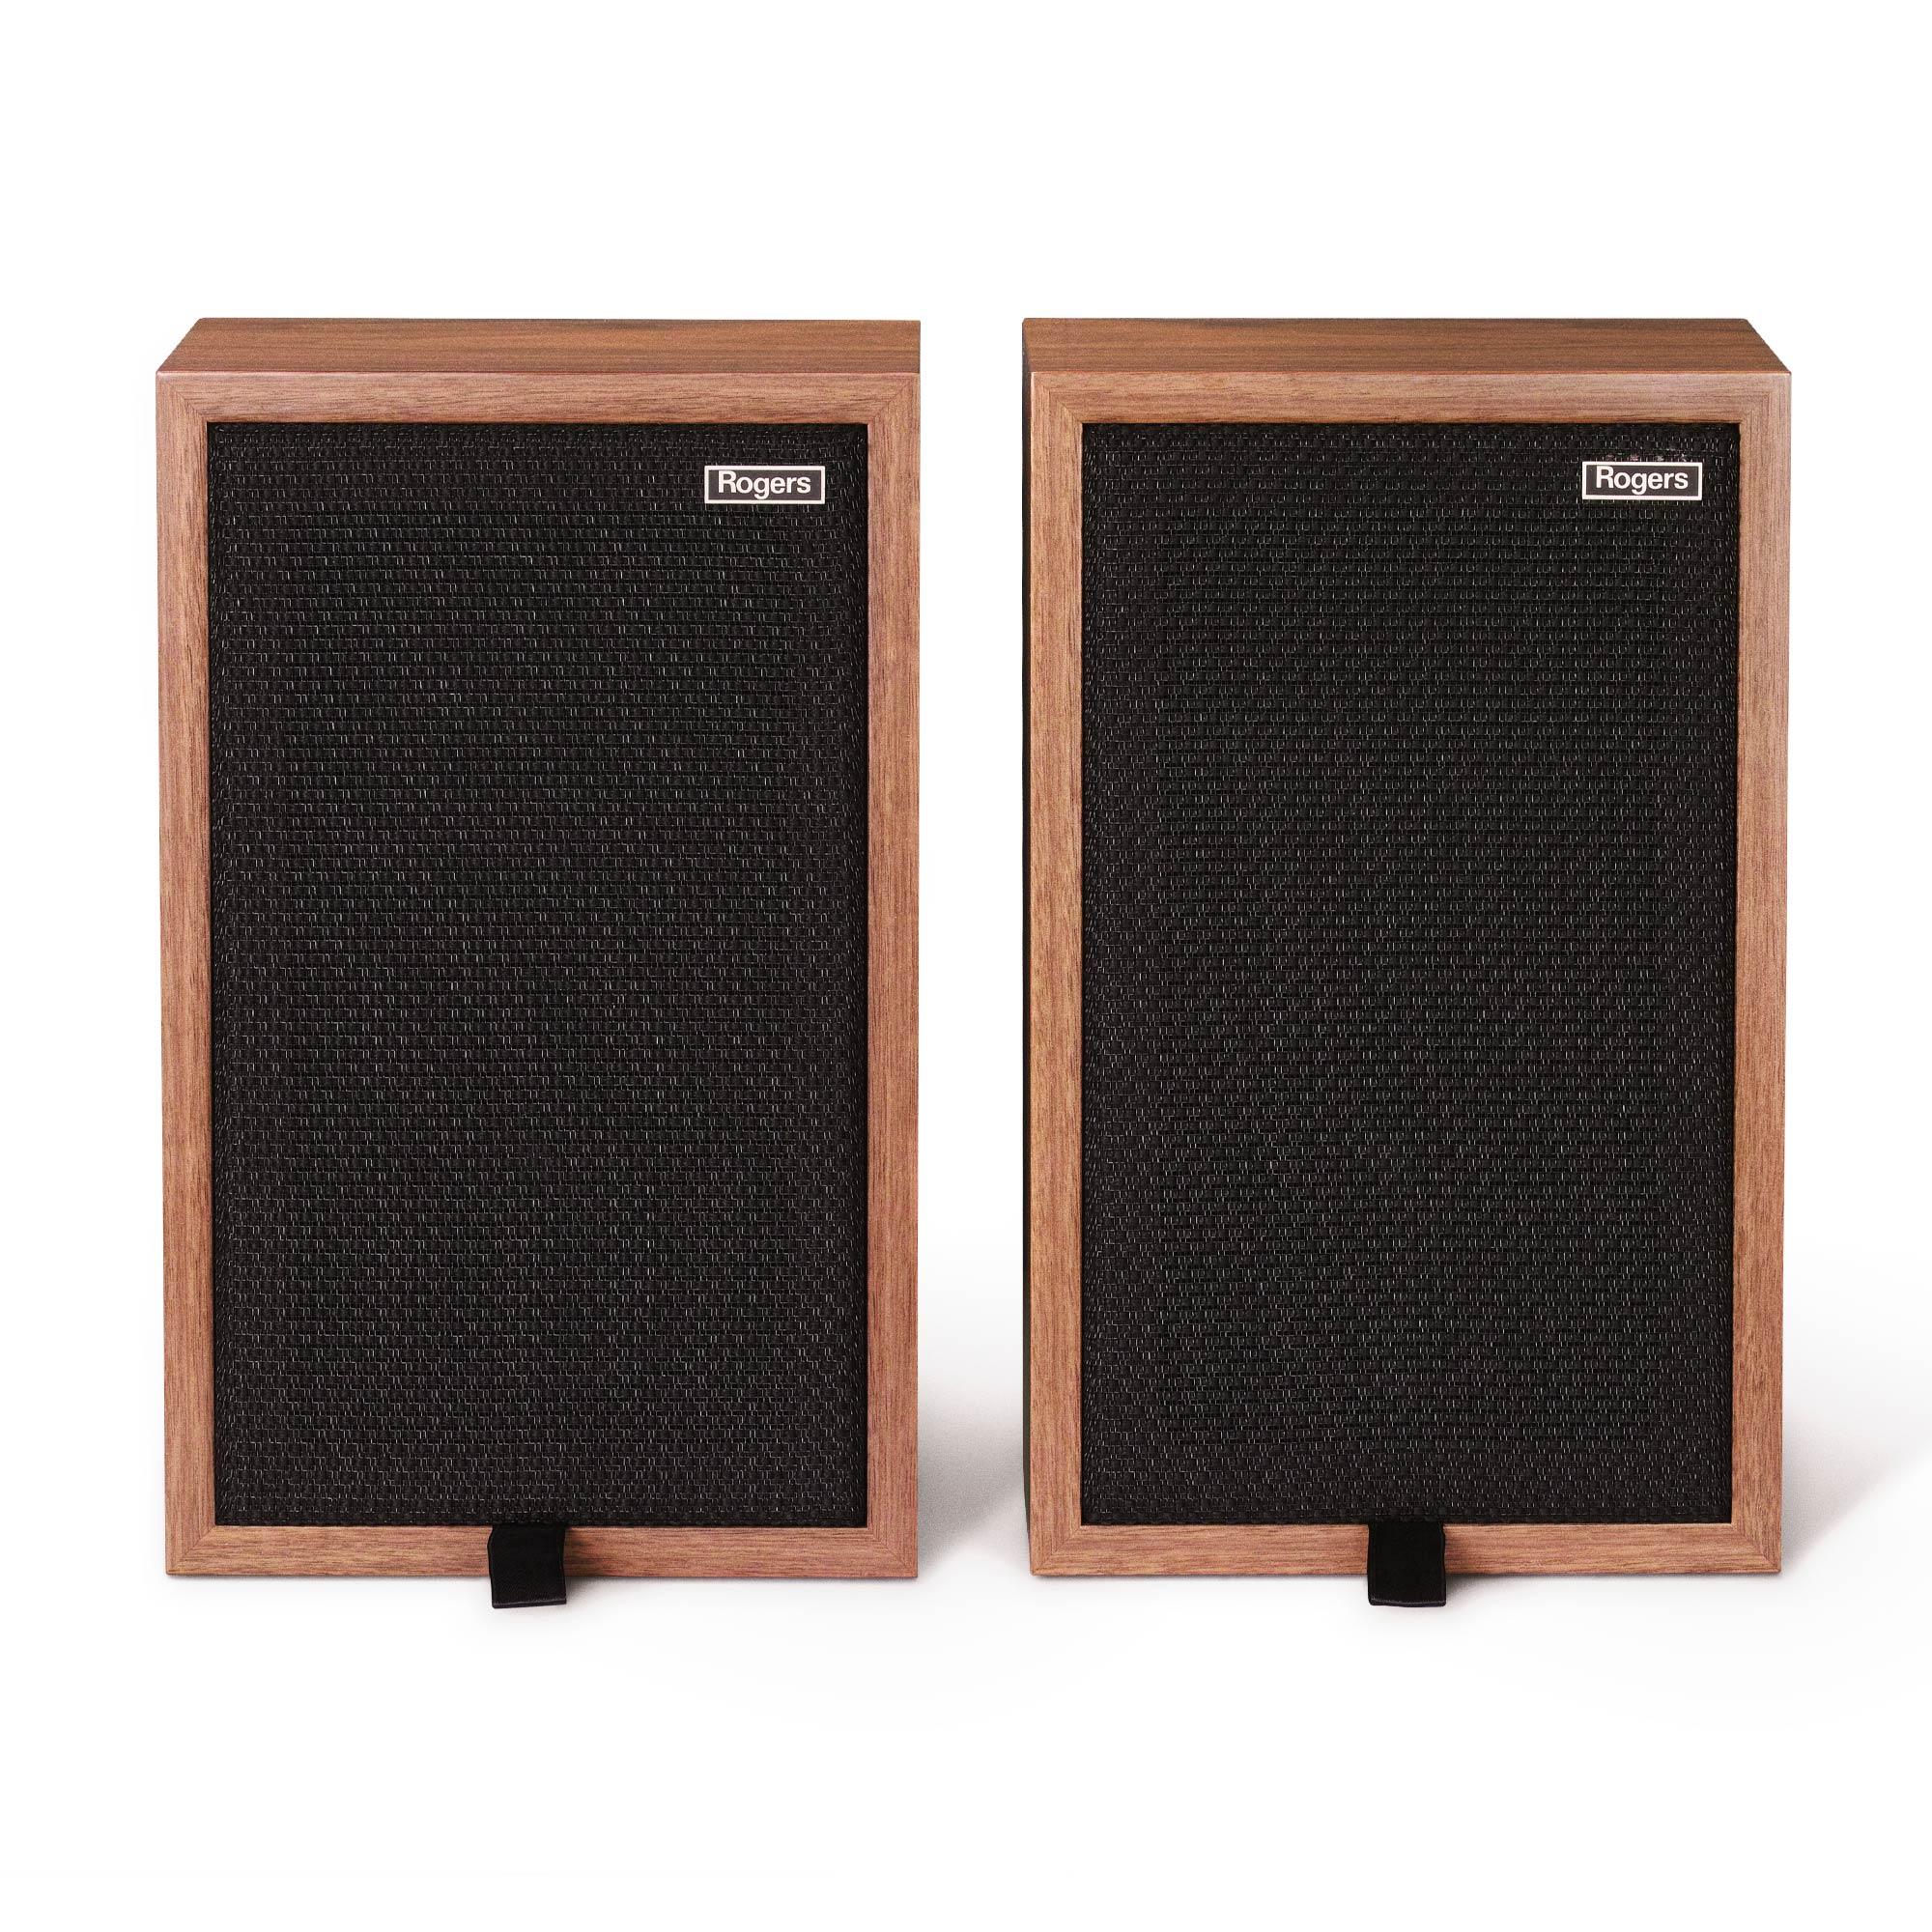 rogers-ls3-5a-speaker-3.jpg